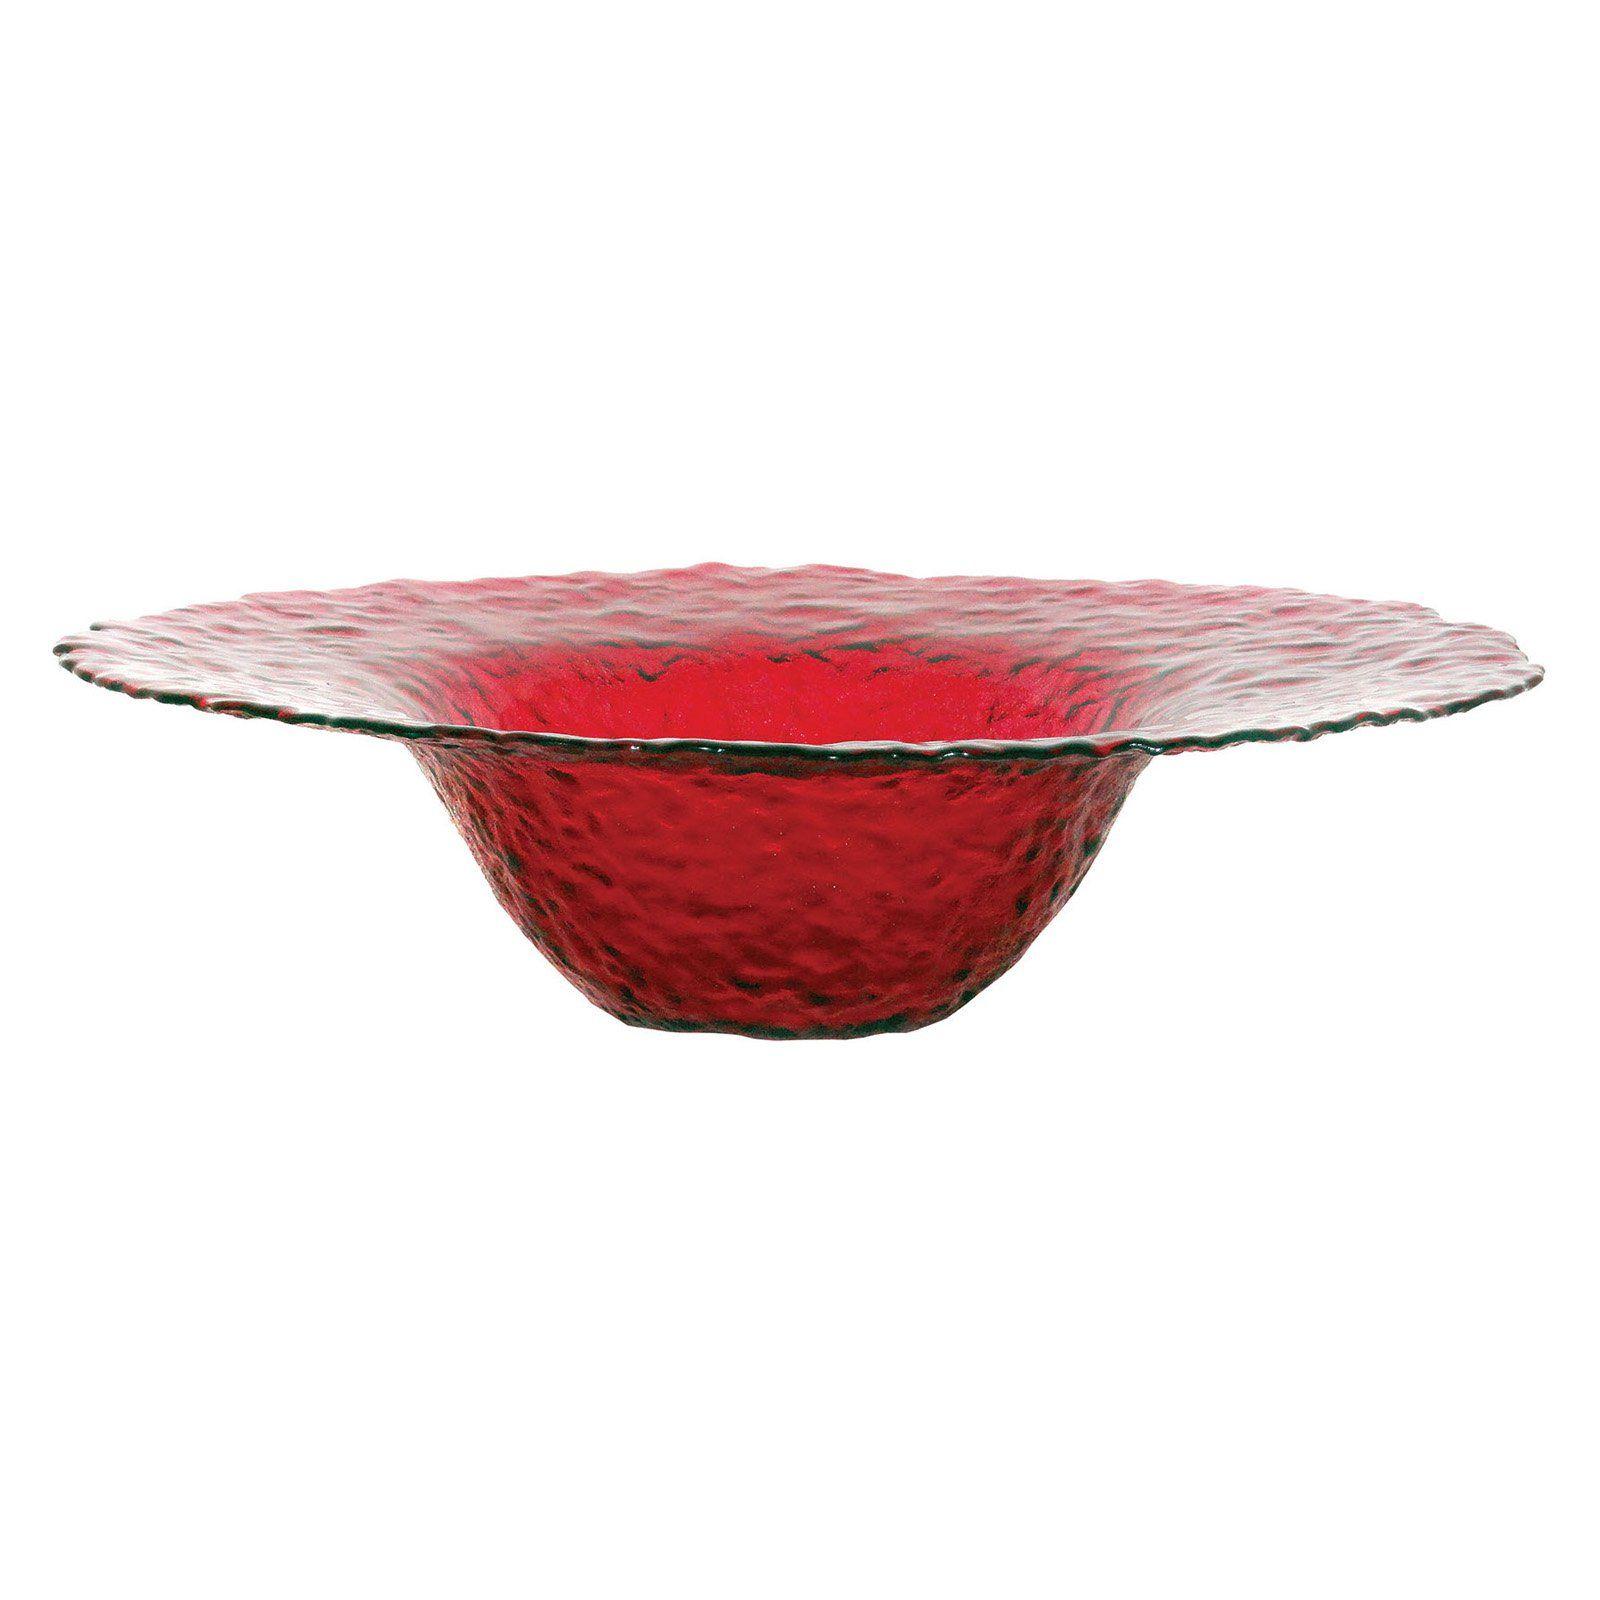 ELK Lighting Bonnet Decorative Bowl - 304644